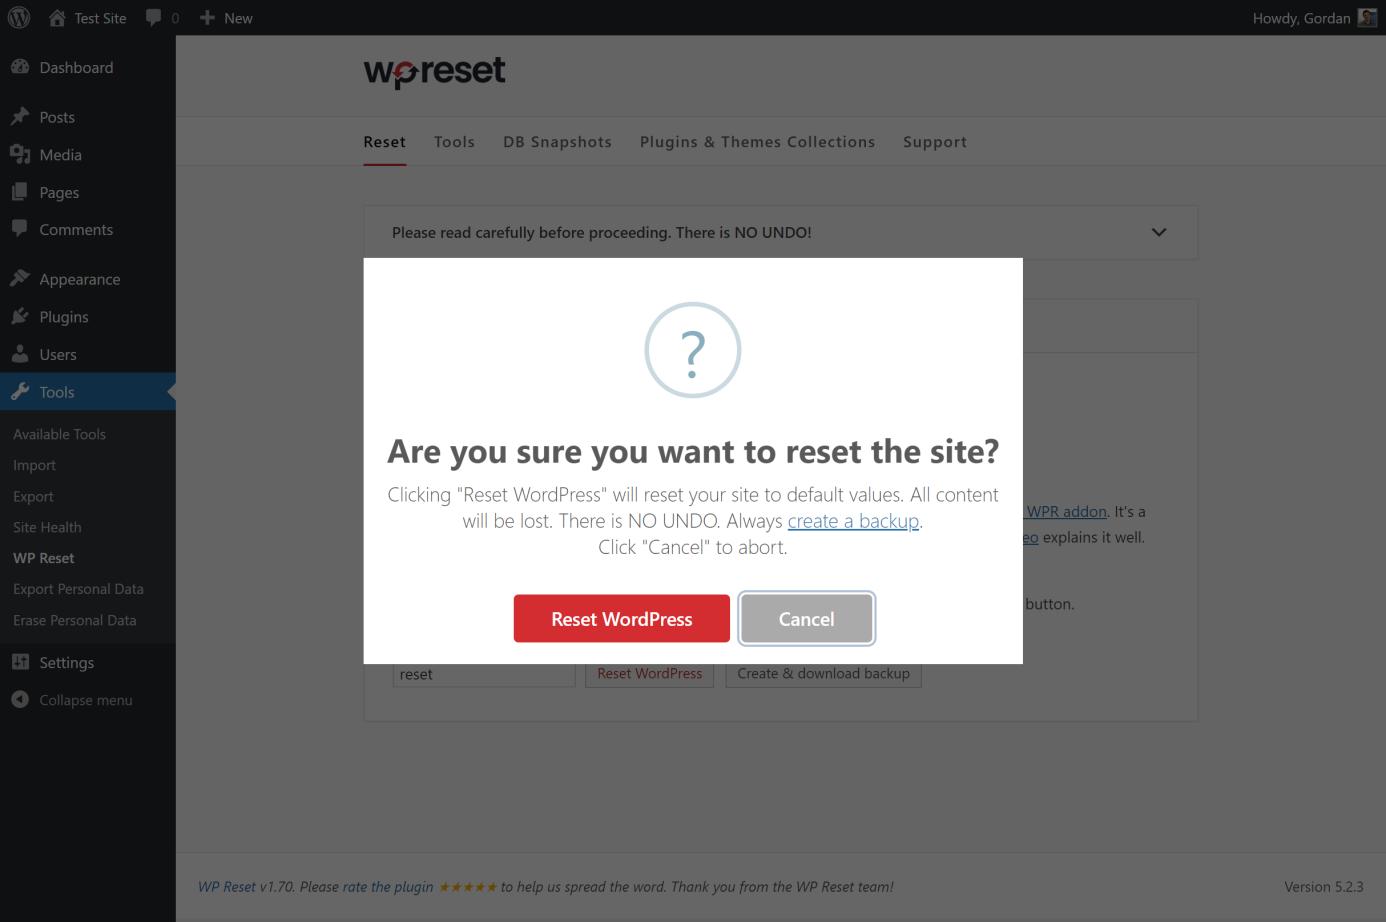 reseting website with wpreset 2